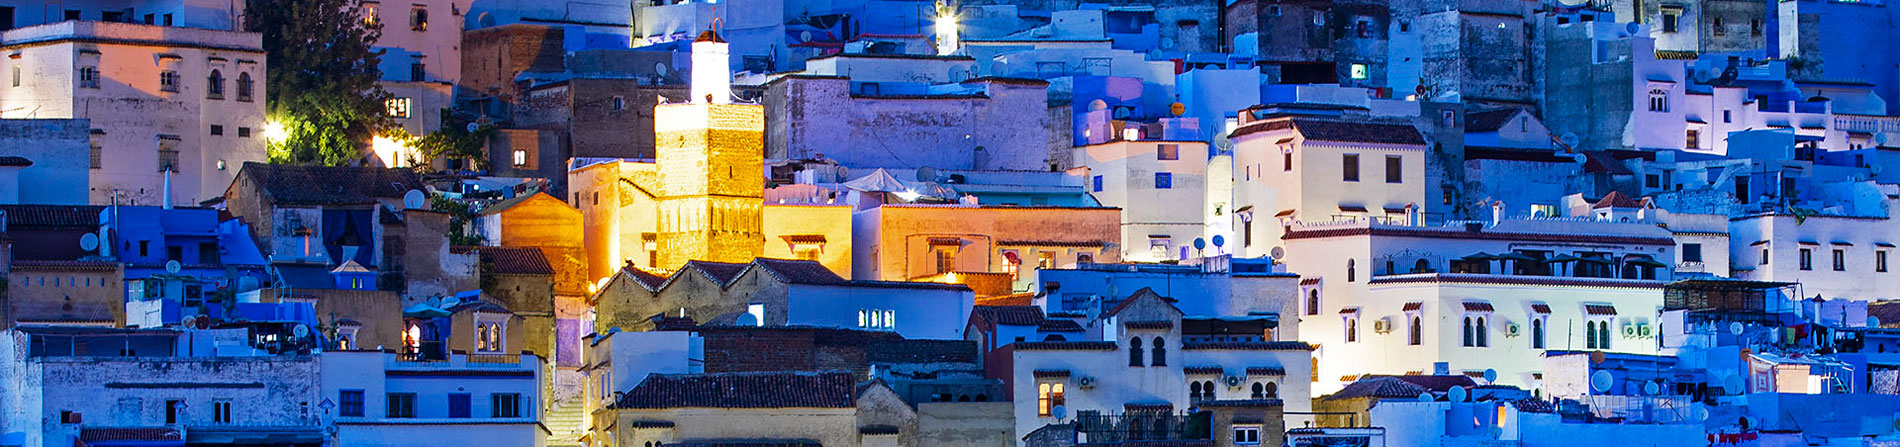 2021 03 06 Marokko 05